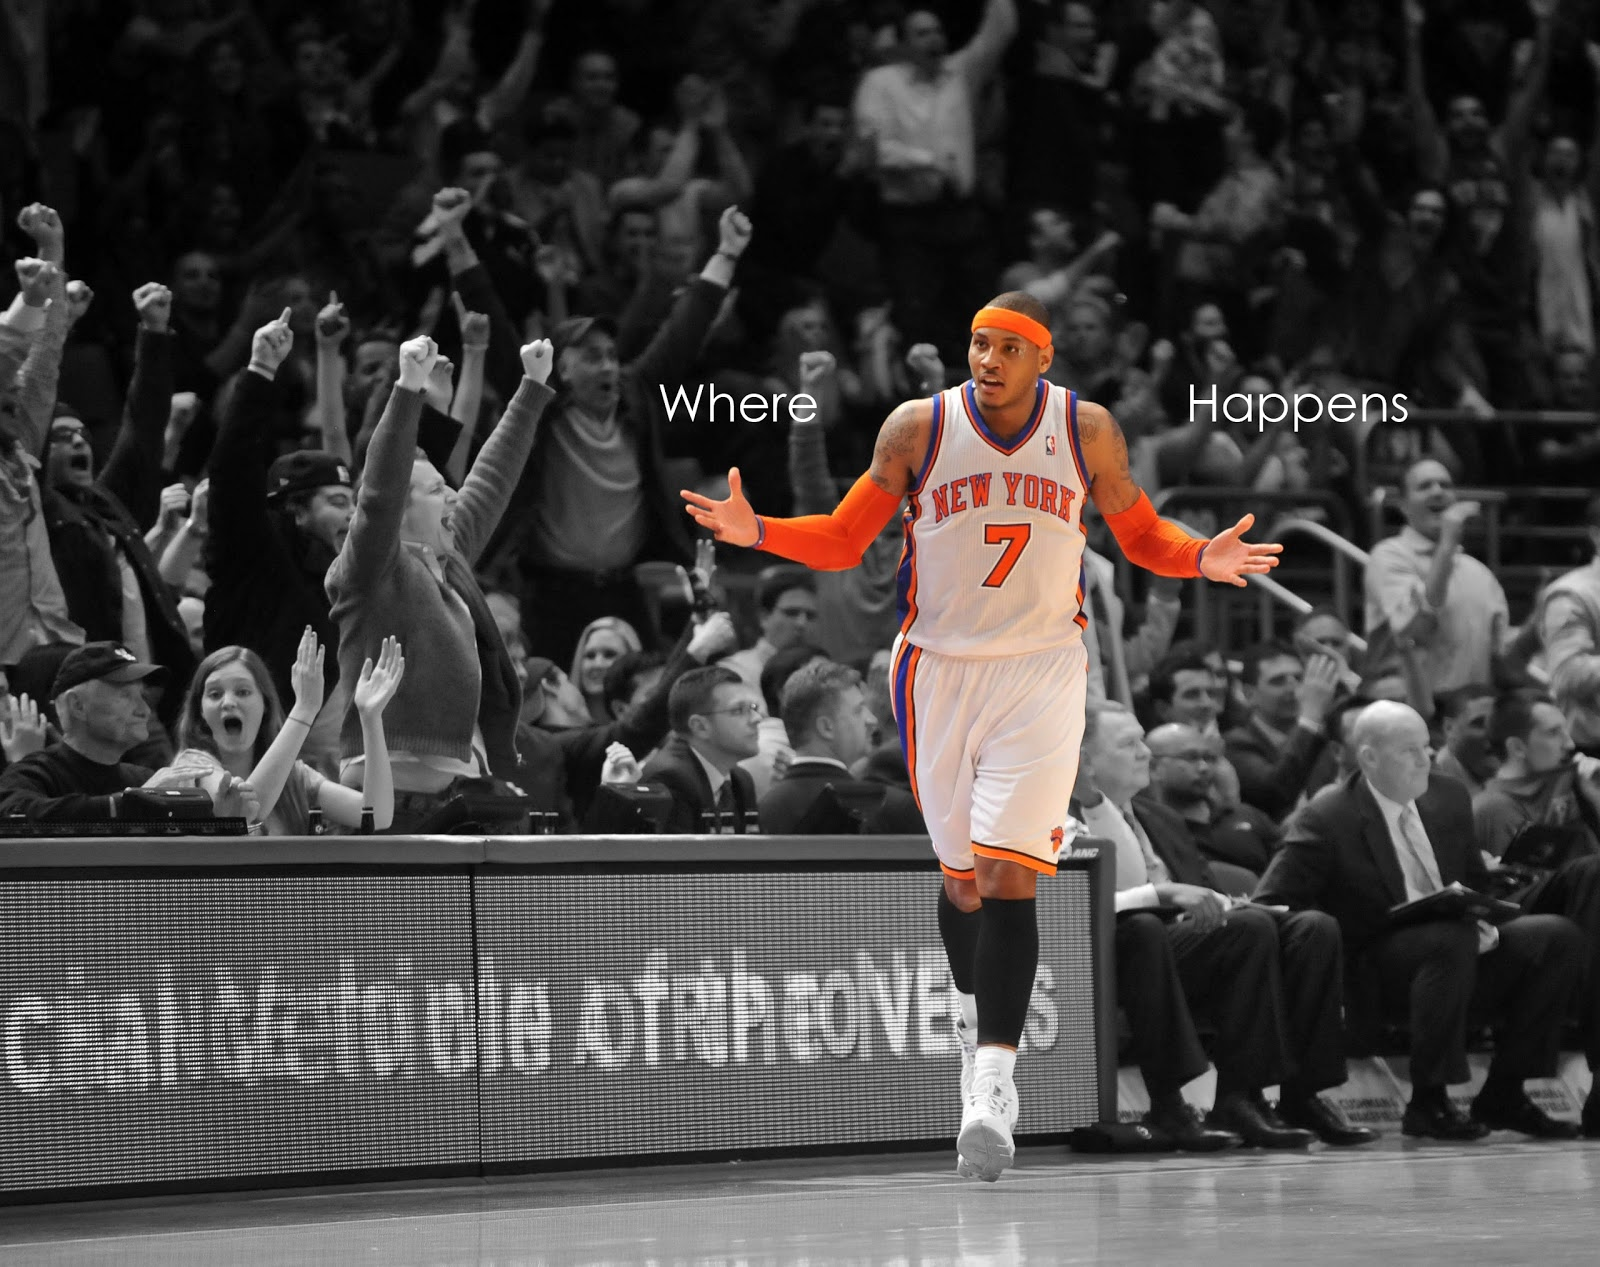 Anthony HD wallpapers NBA NBA Wallpapers Basket Ball Wallpapers 1600x1267